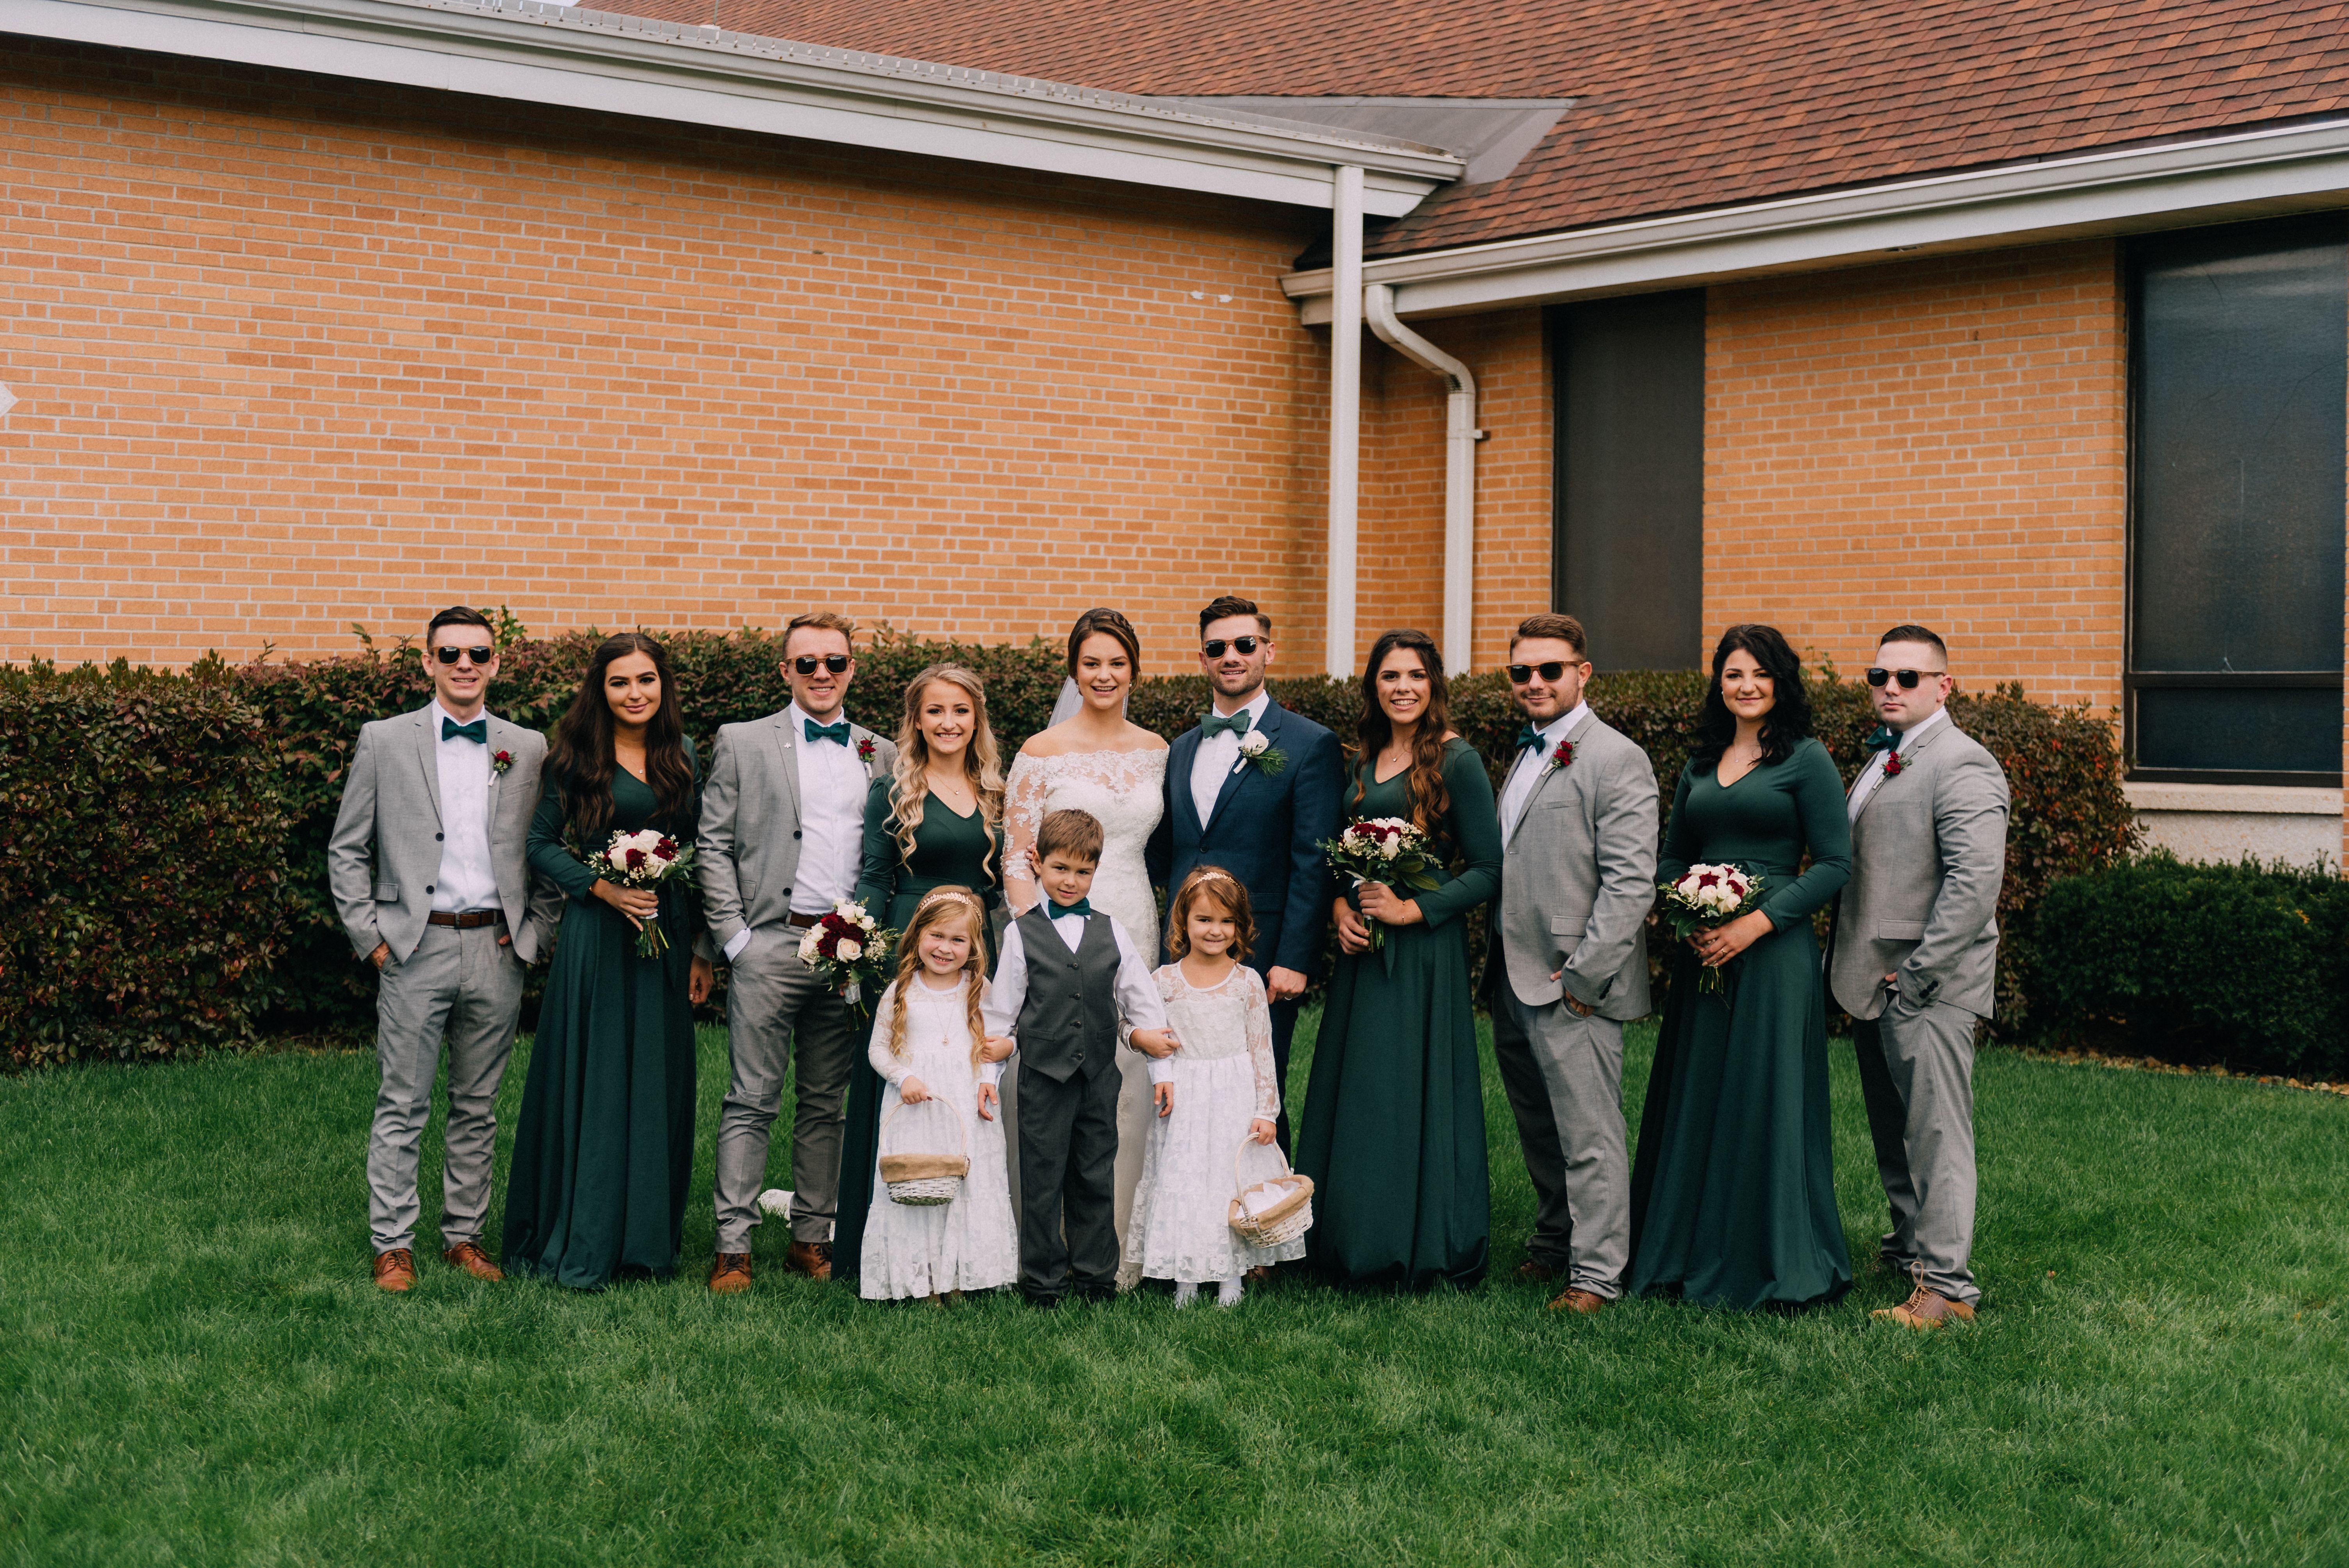 Grey Navy Blue Suits On Grooms Men Green Bridesmaid Dresses Green Bridesmaid Dresses Green Bridesmaid Maroon Wedding